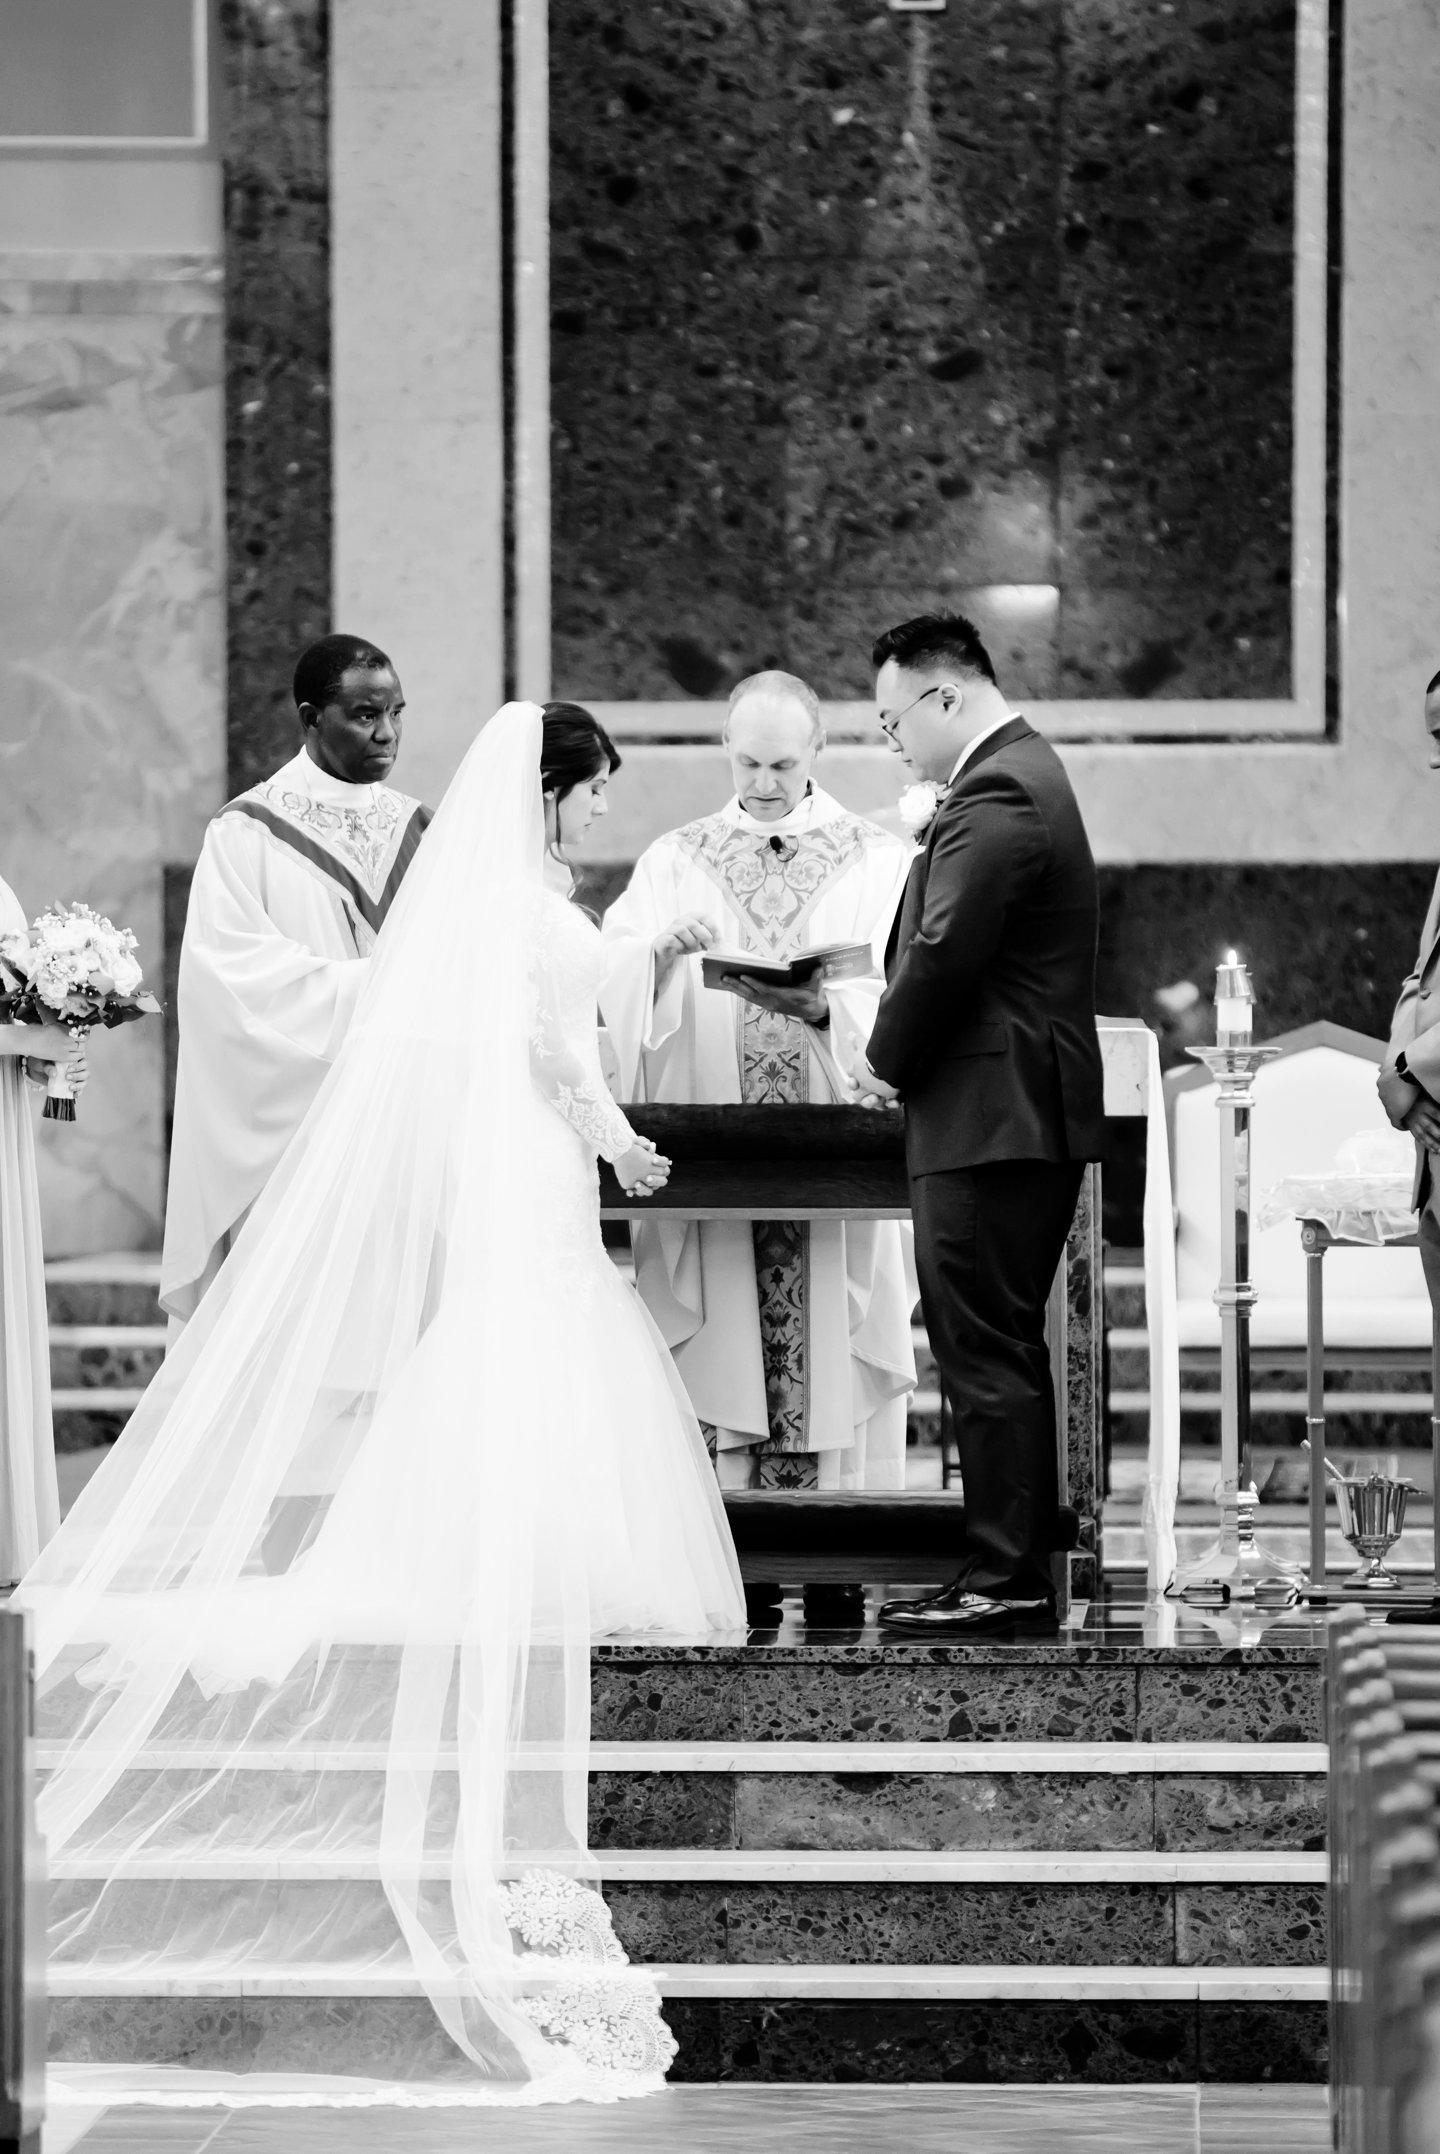 lake-geneva-fine-art-wedding-photographer-santos22